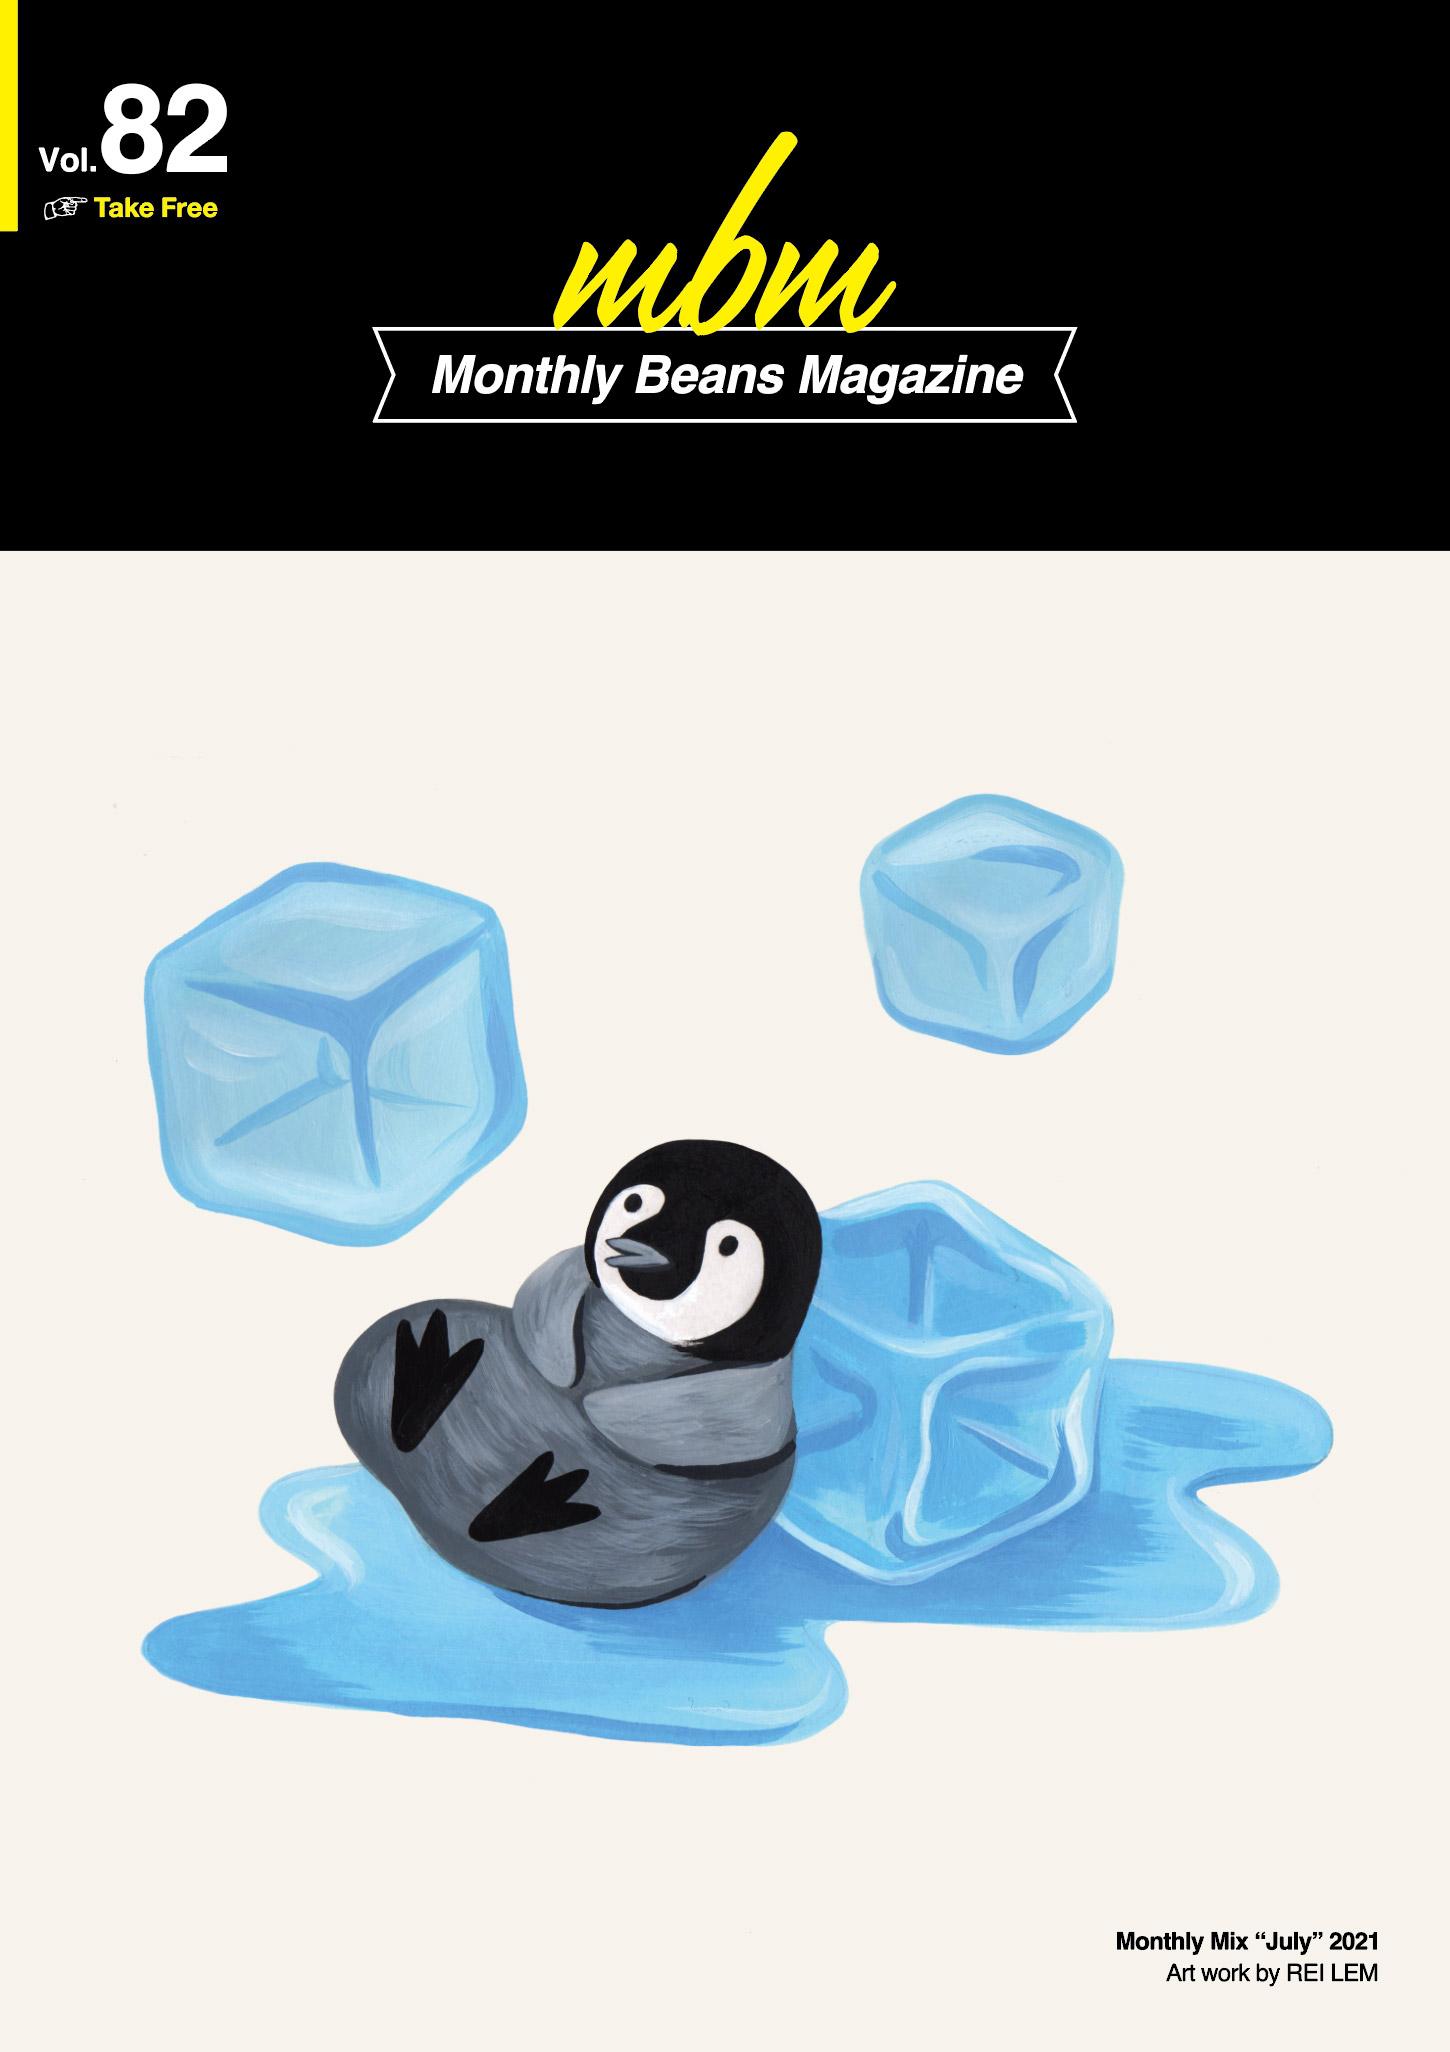 Monthly Beans Magazine 2021年7月号 [vol.82]